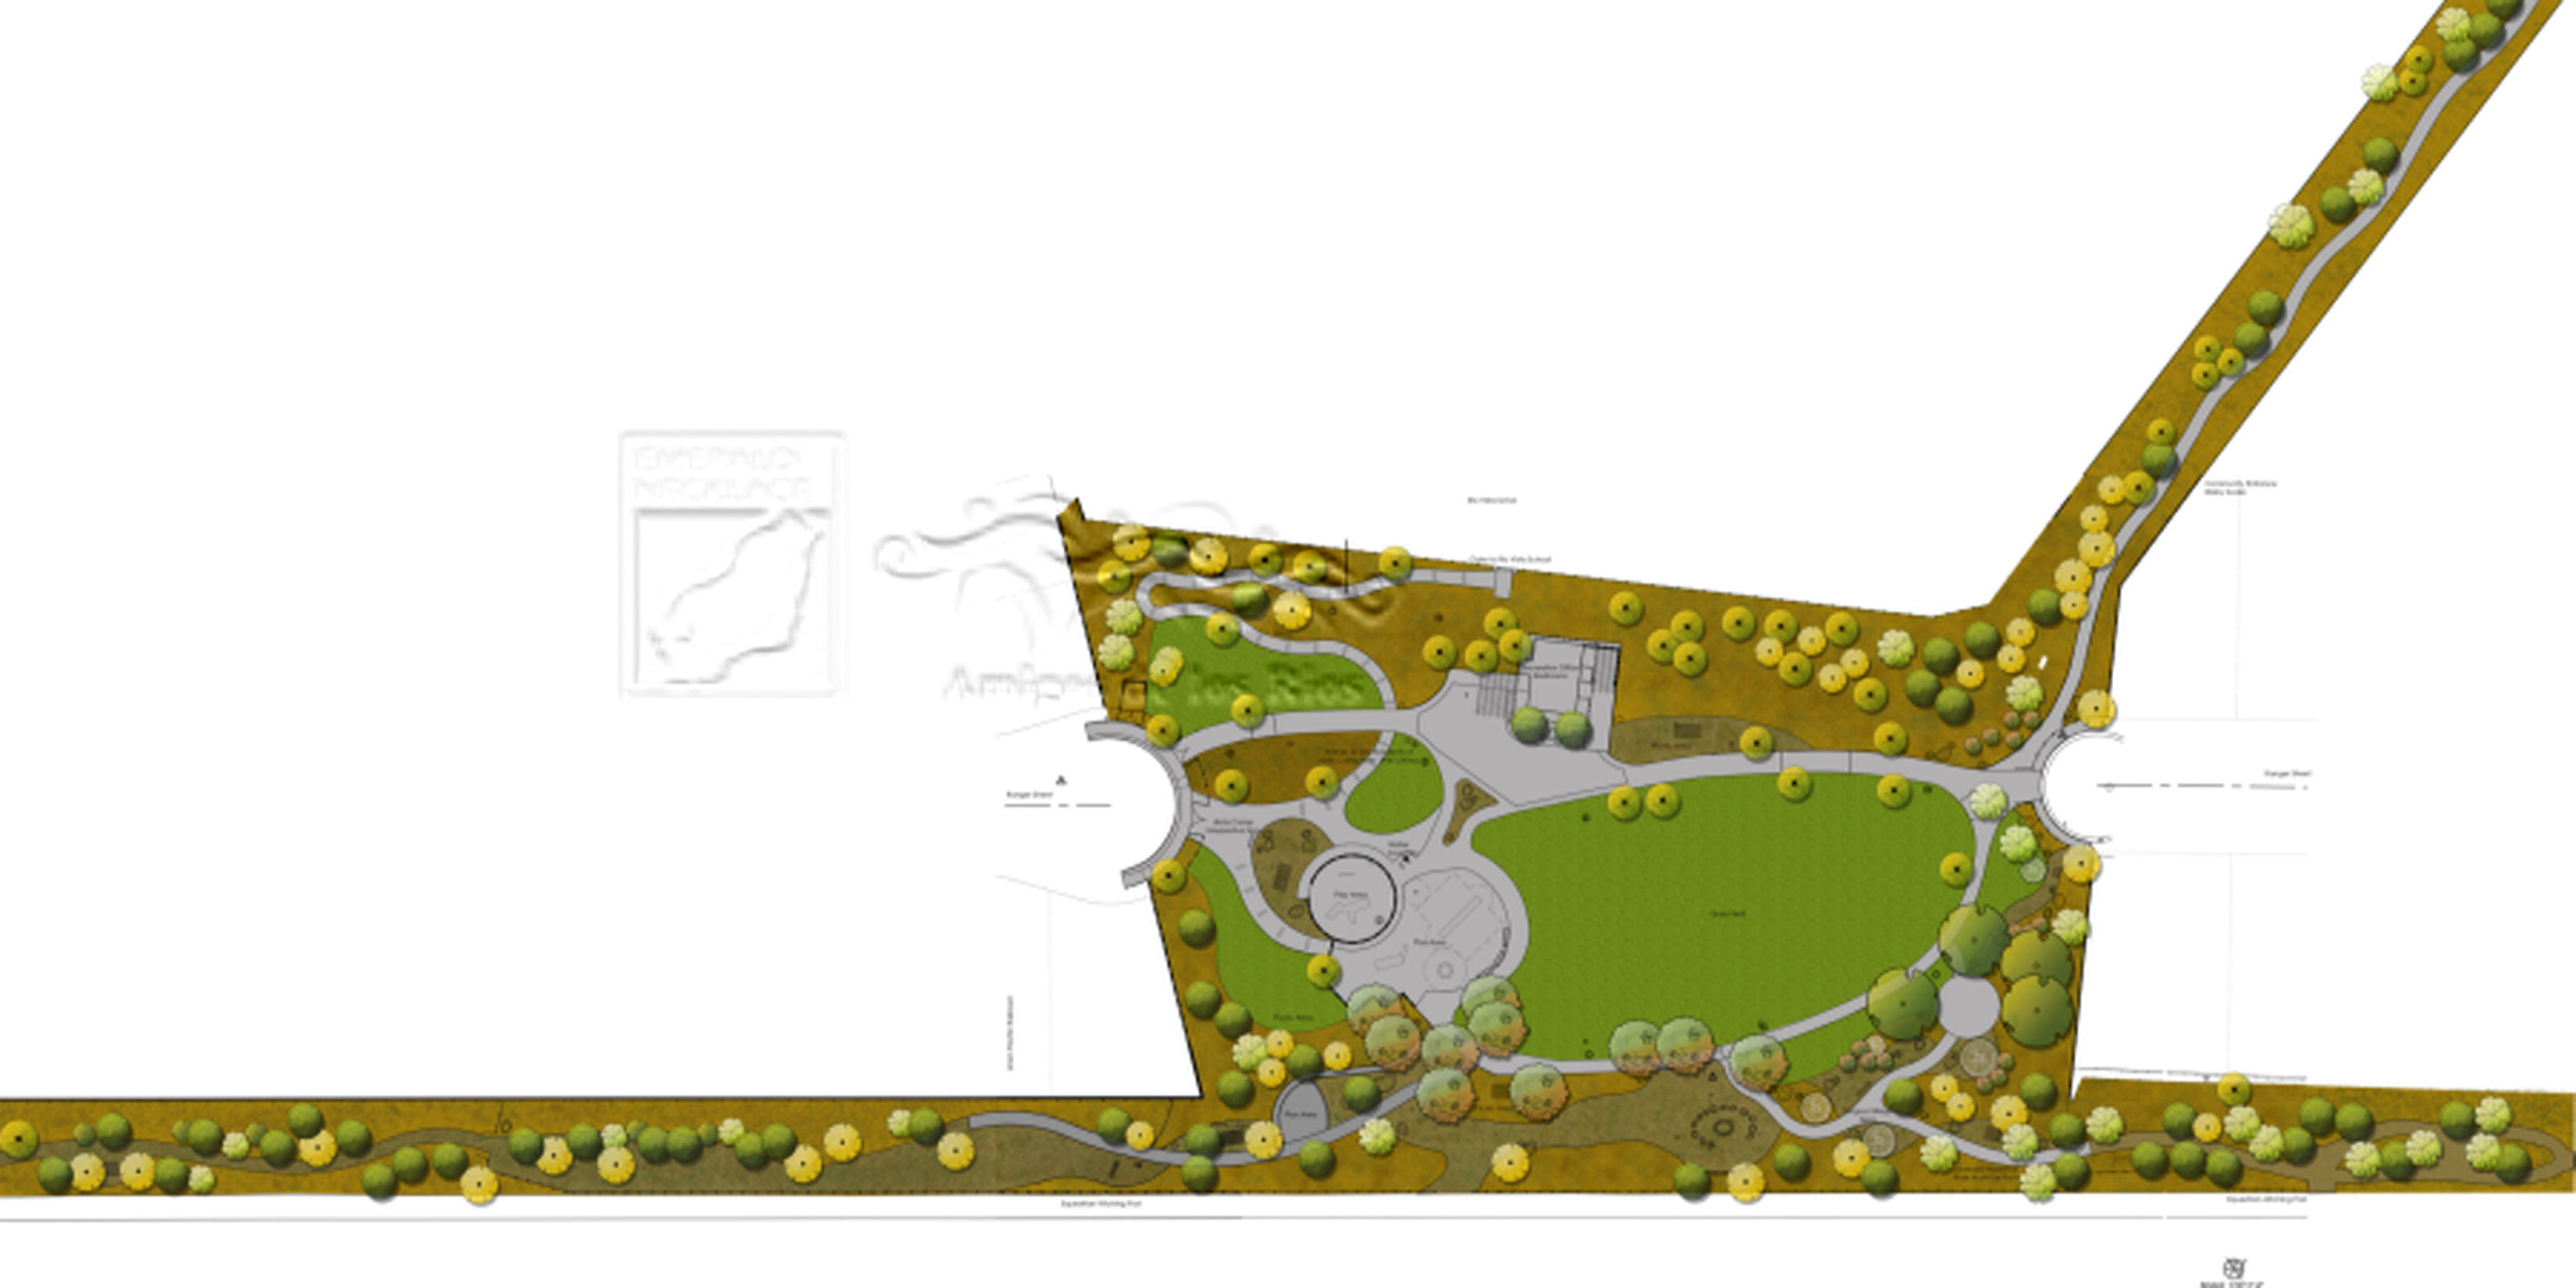 Rio Vista Park and Trail Design Concept Plan